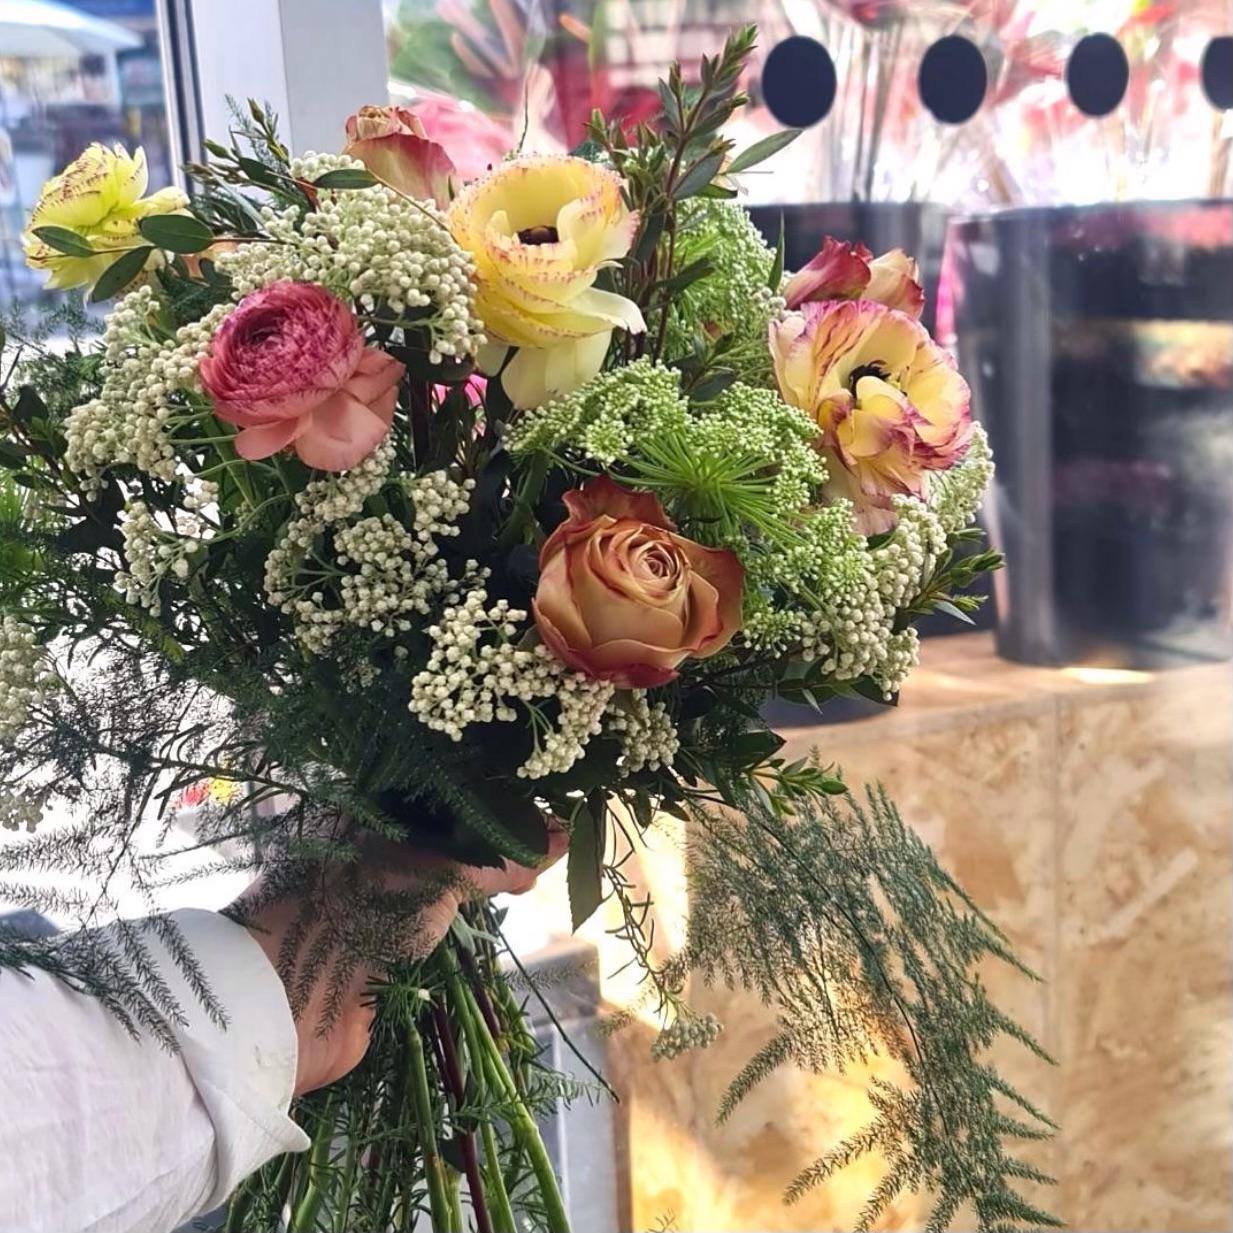 Smukke buketter til skarpe priser: Magasin Flowers rykker ind i Aalborg